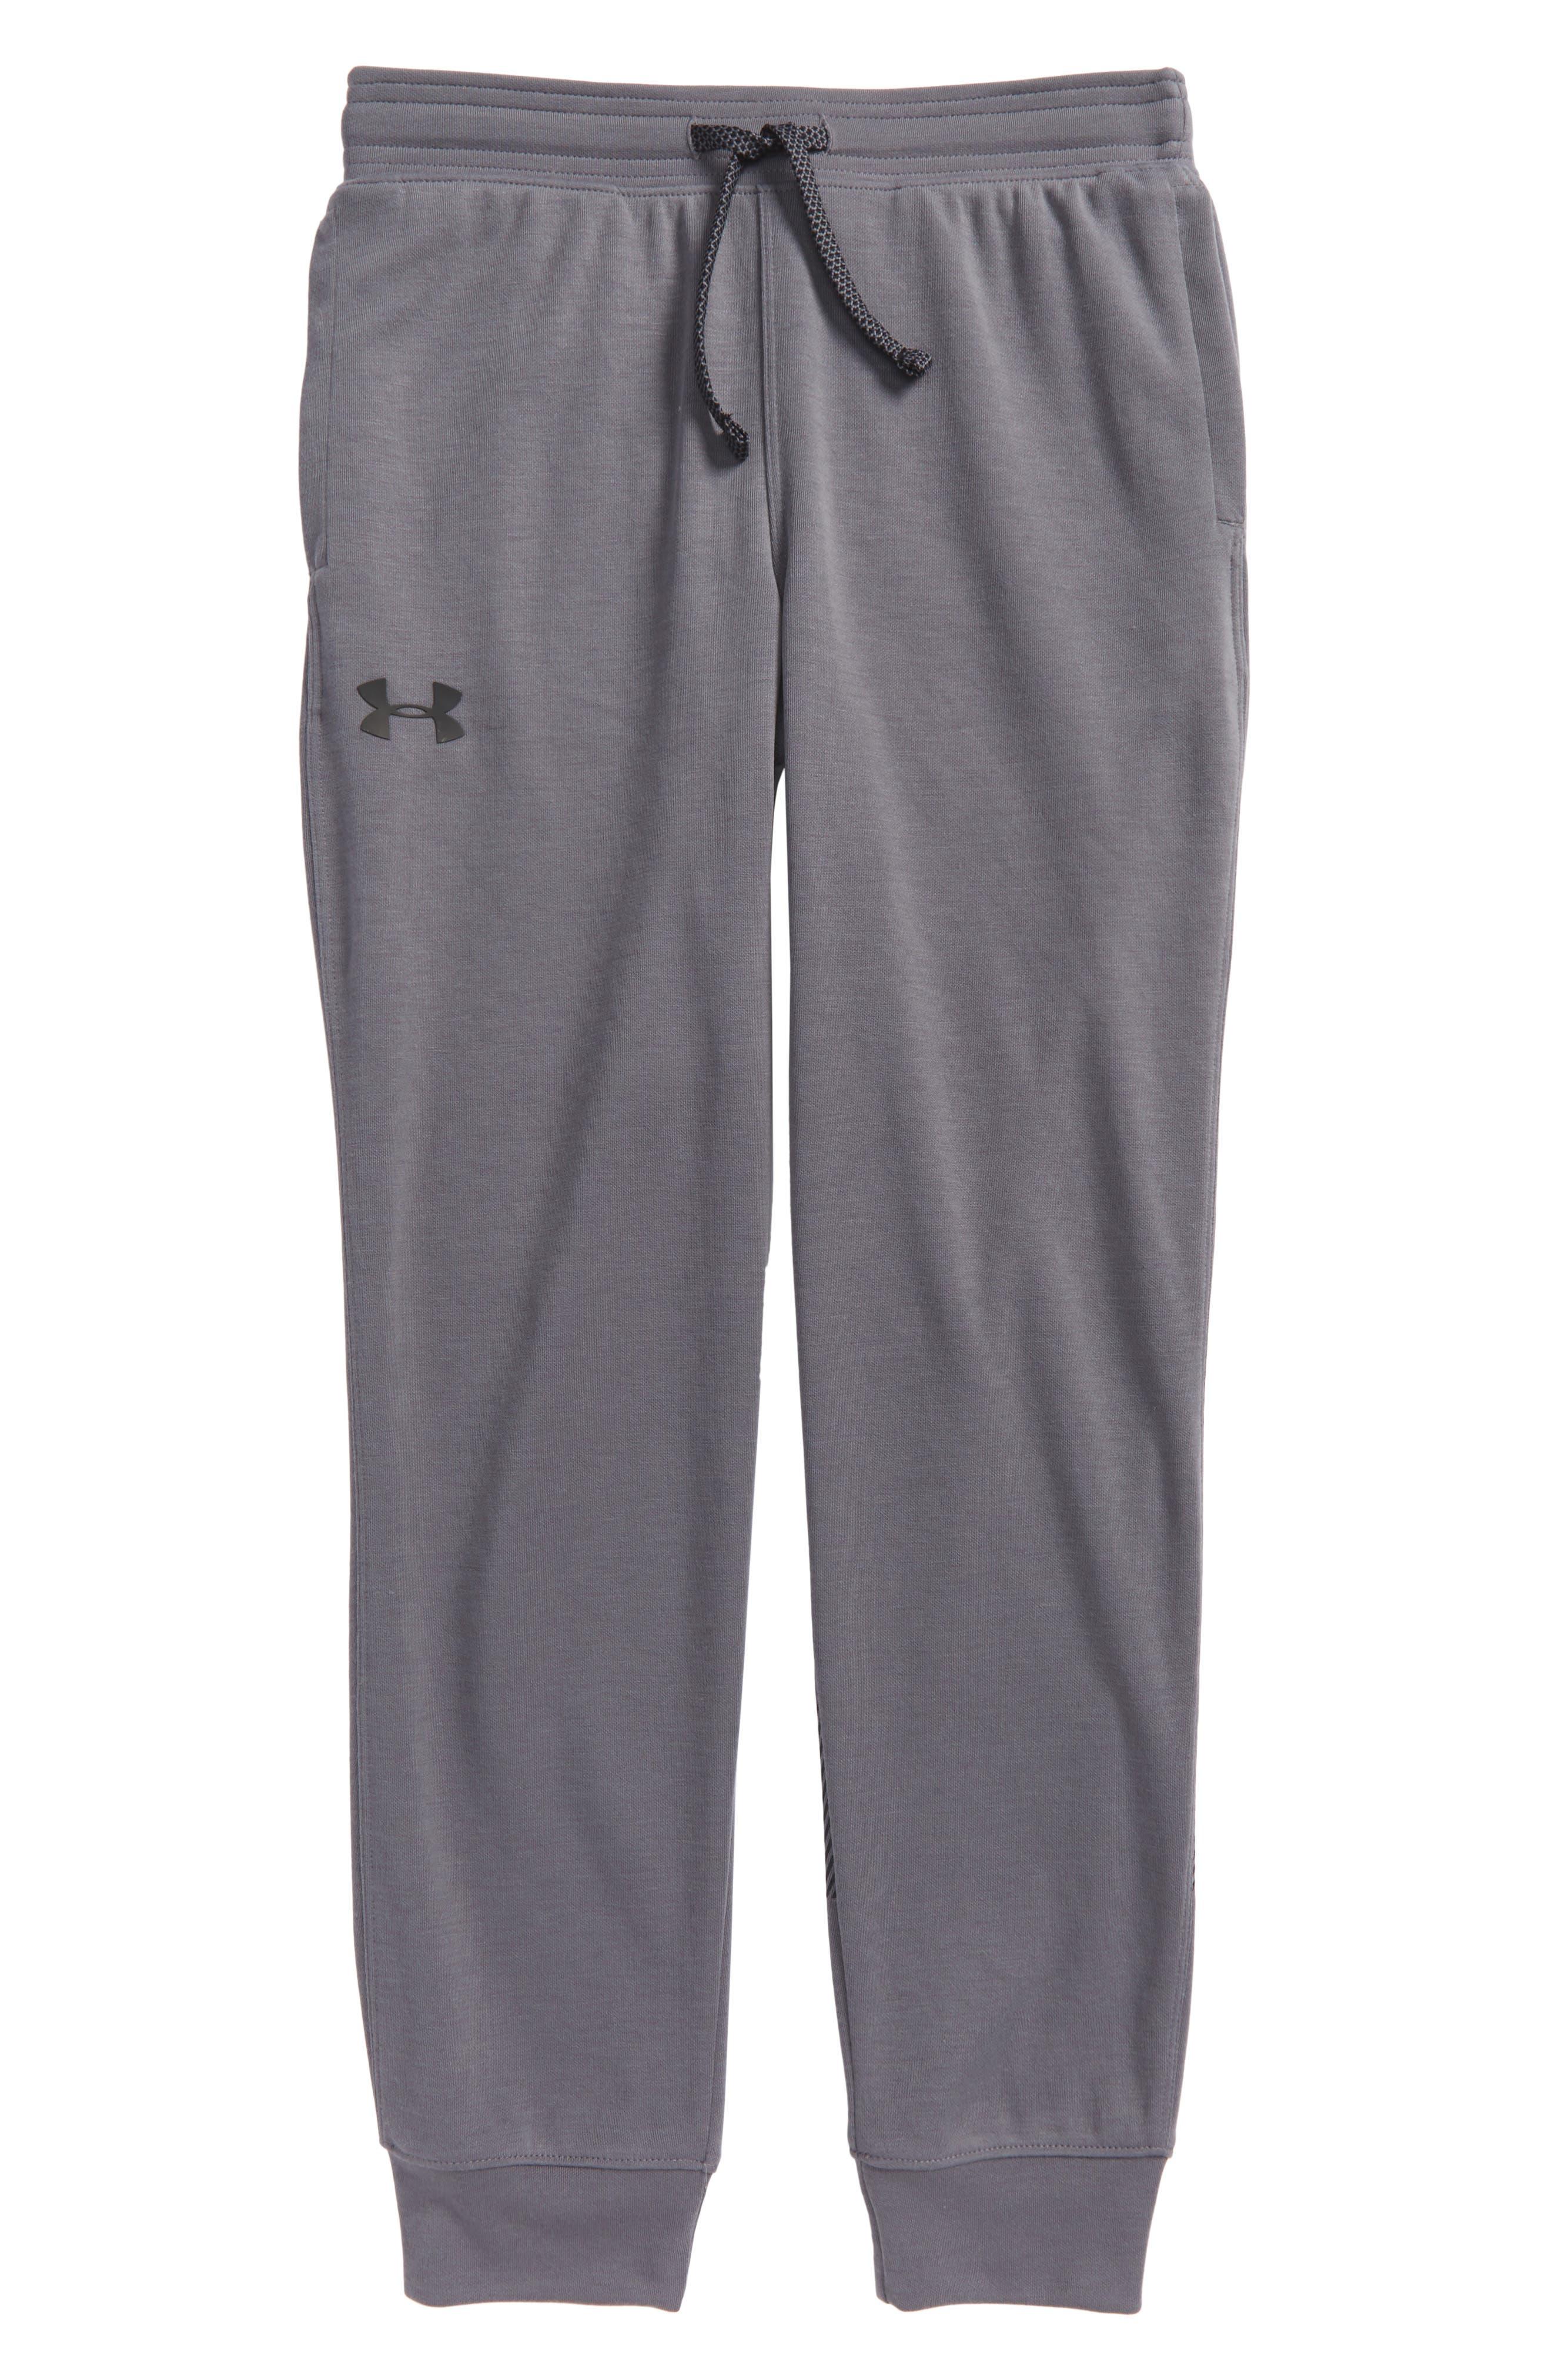 Threadborne Tech Sweatpants,                         Main,                         color, Graphite/ Black